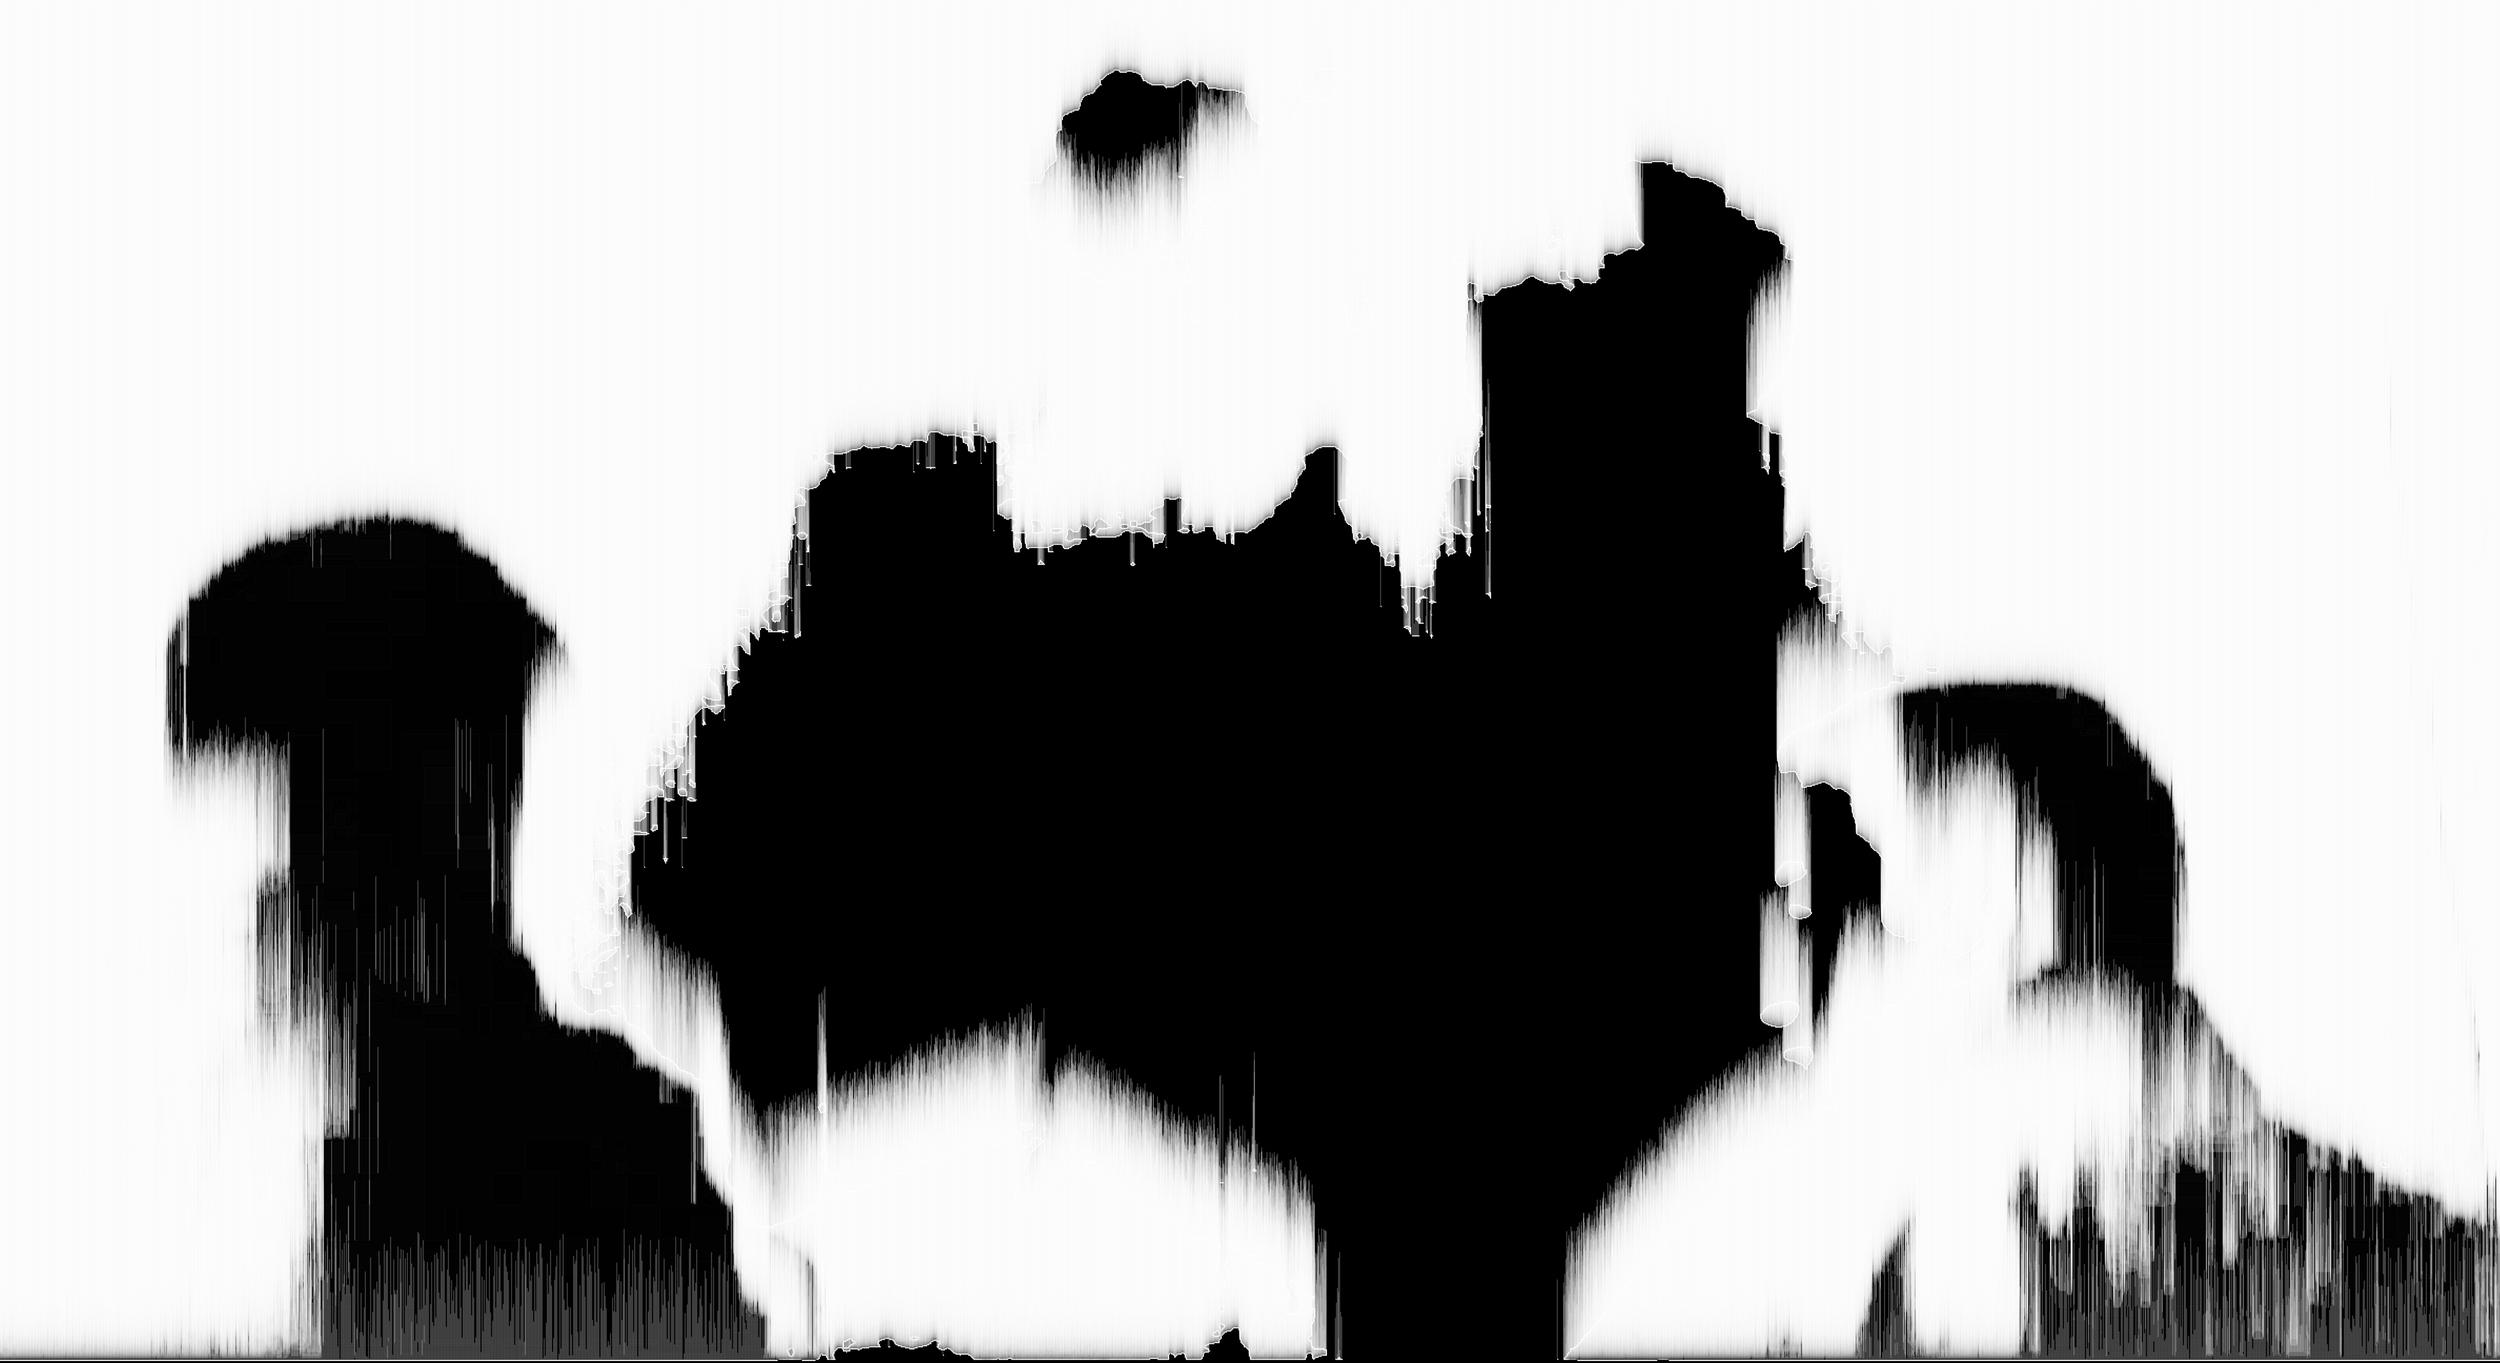 Greg Pond, Hypo  2013, softwaregenerated archival digital print, edition of 9